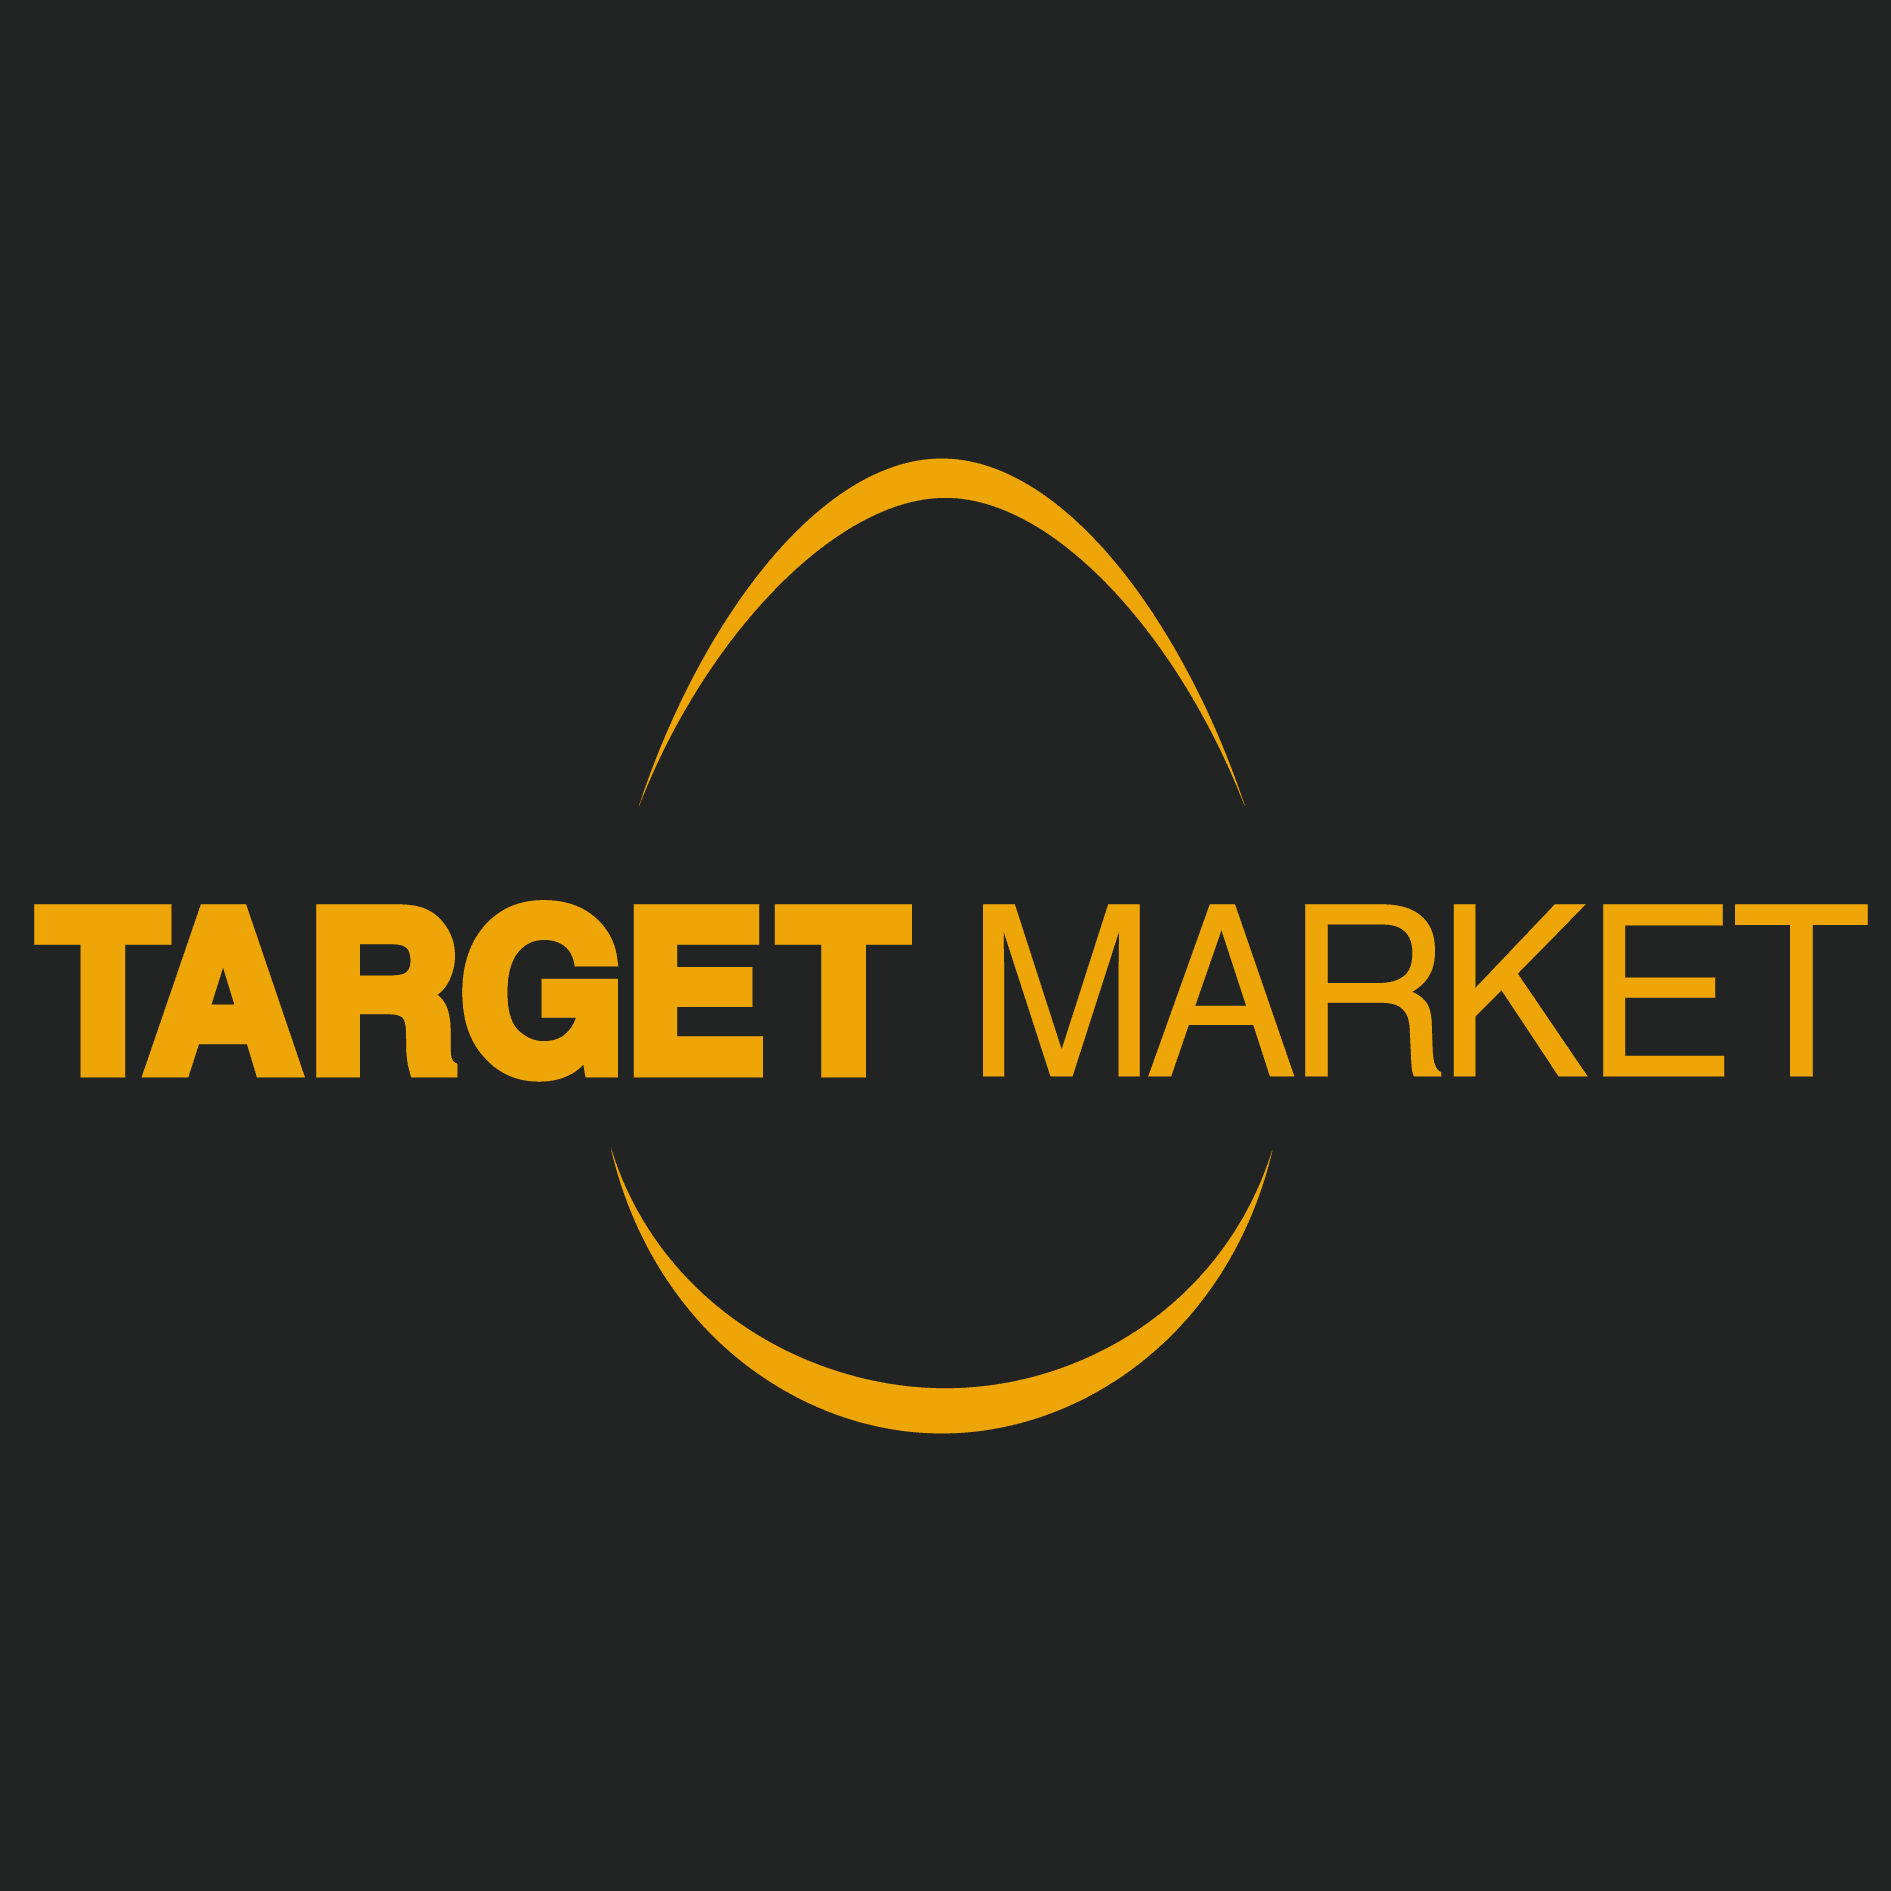 Target market story